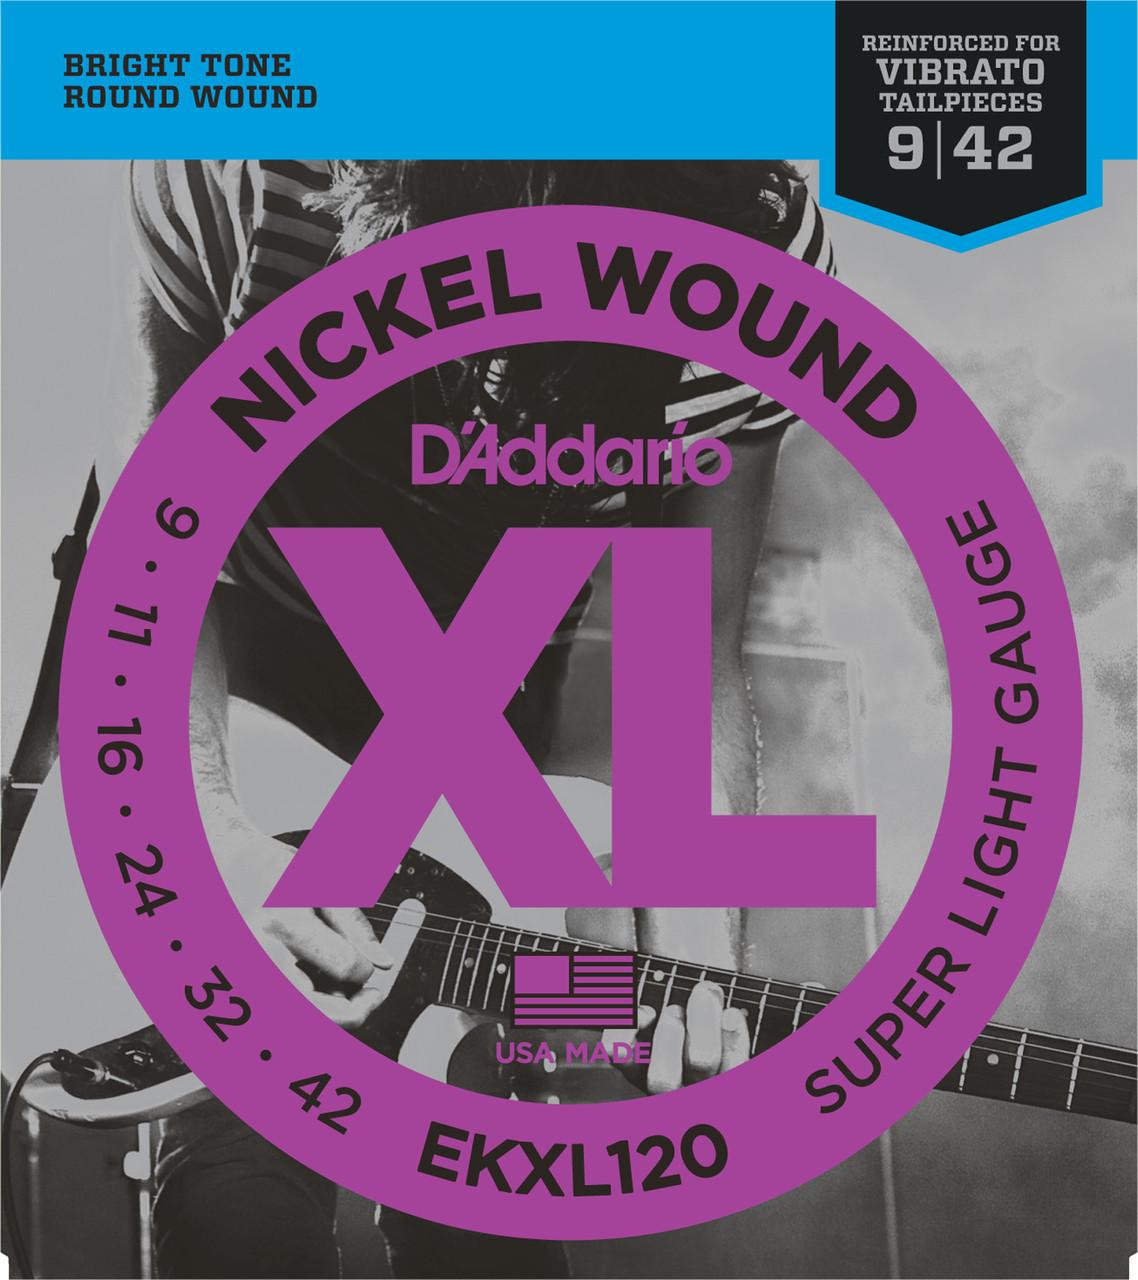 D'addario EKXL120 Kahler Electric Guitar Strings